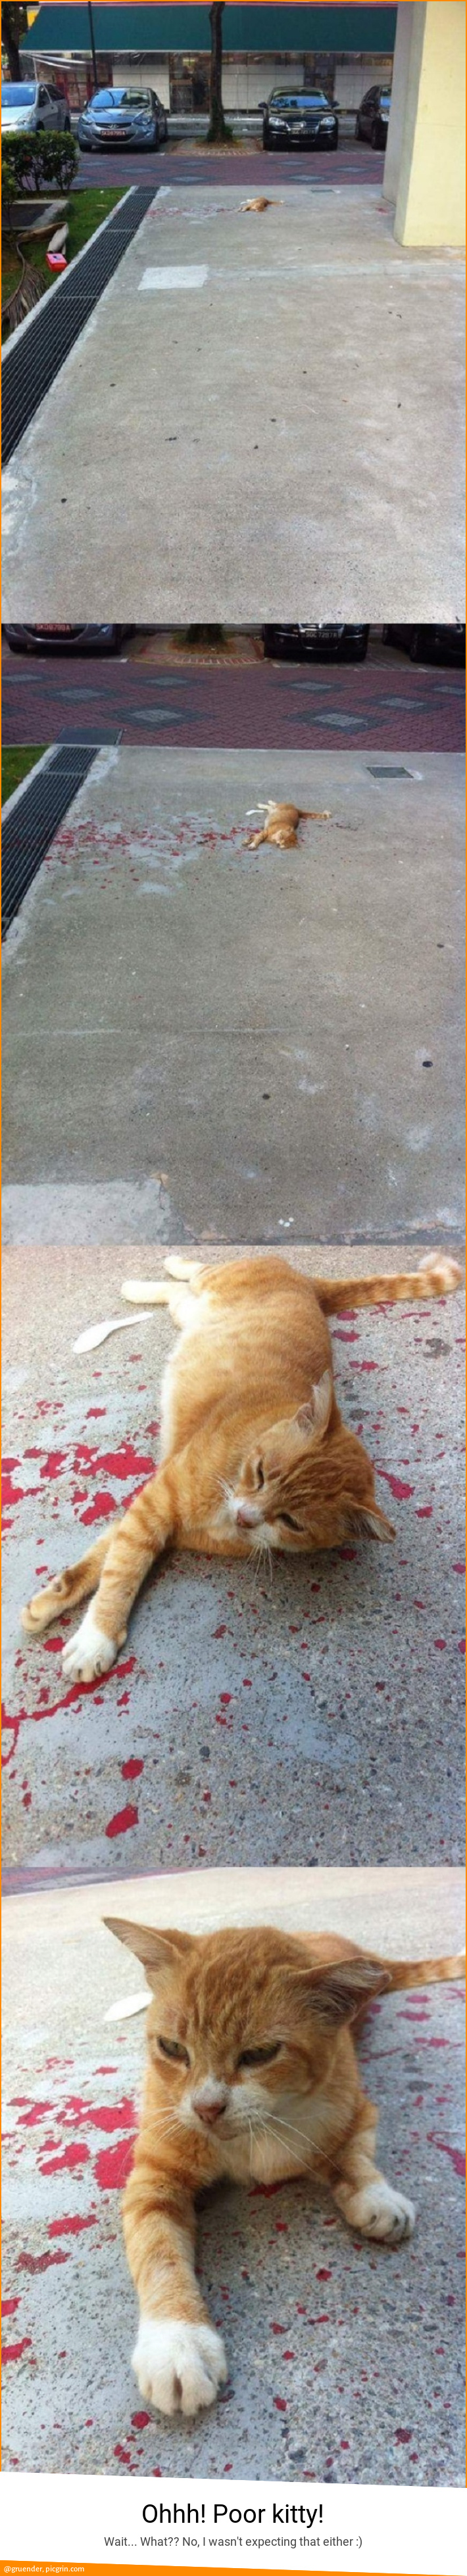 Ohhh! Poor kitty!